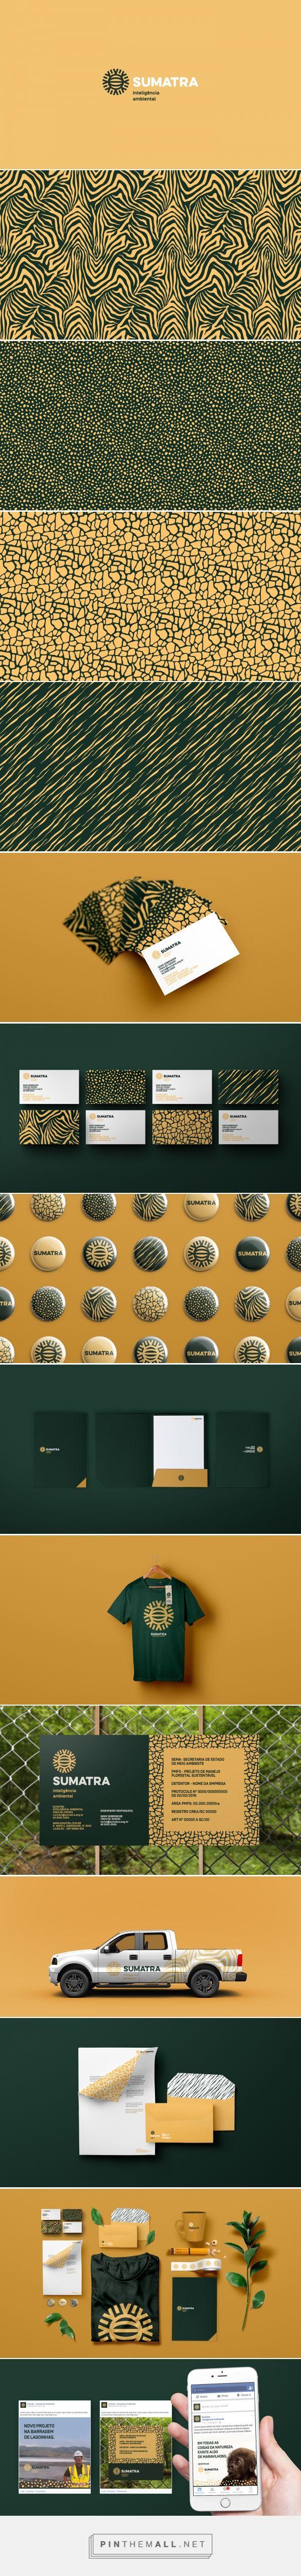 Sumatra intelligent environment Branding on Behance | Fivestar Branding – Design and Branding Agency & Inspiration Gallery